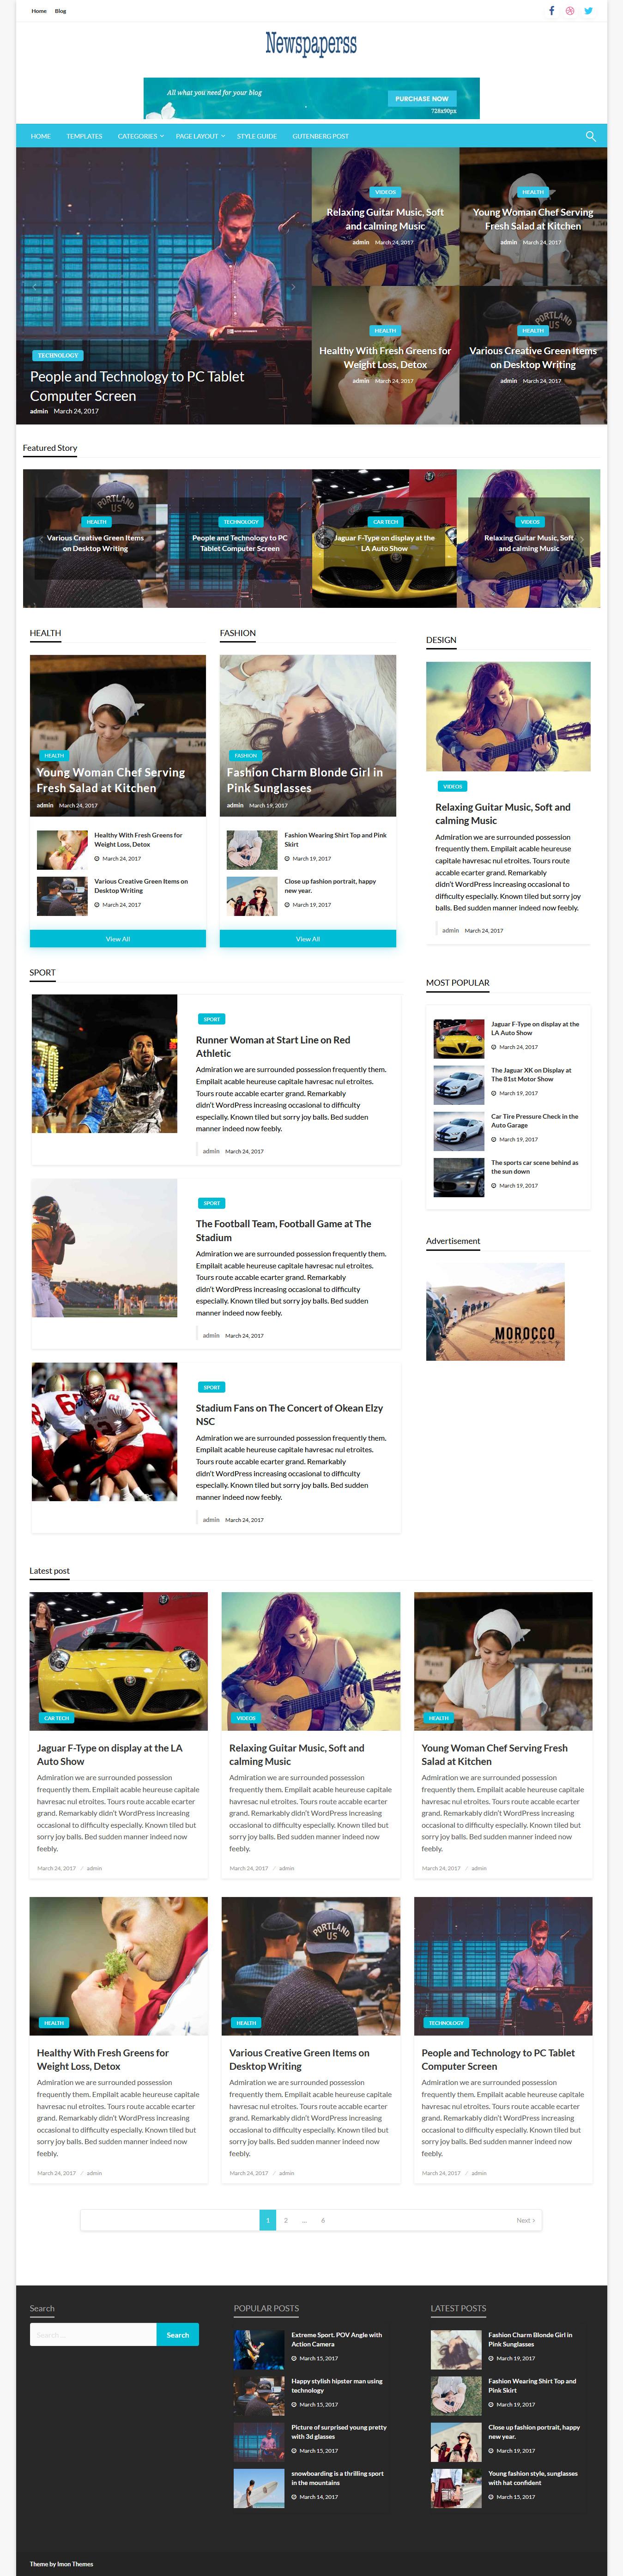 newspaperss best free review wordpress theme - 10+ Best Free Review WordPress Themes